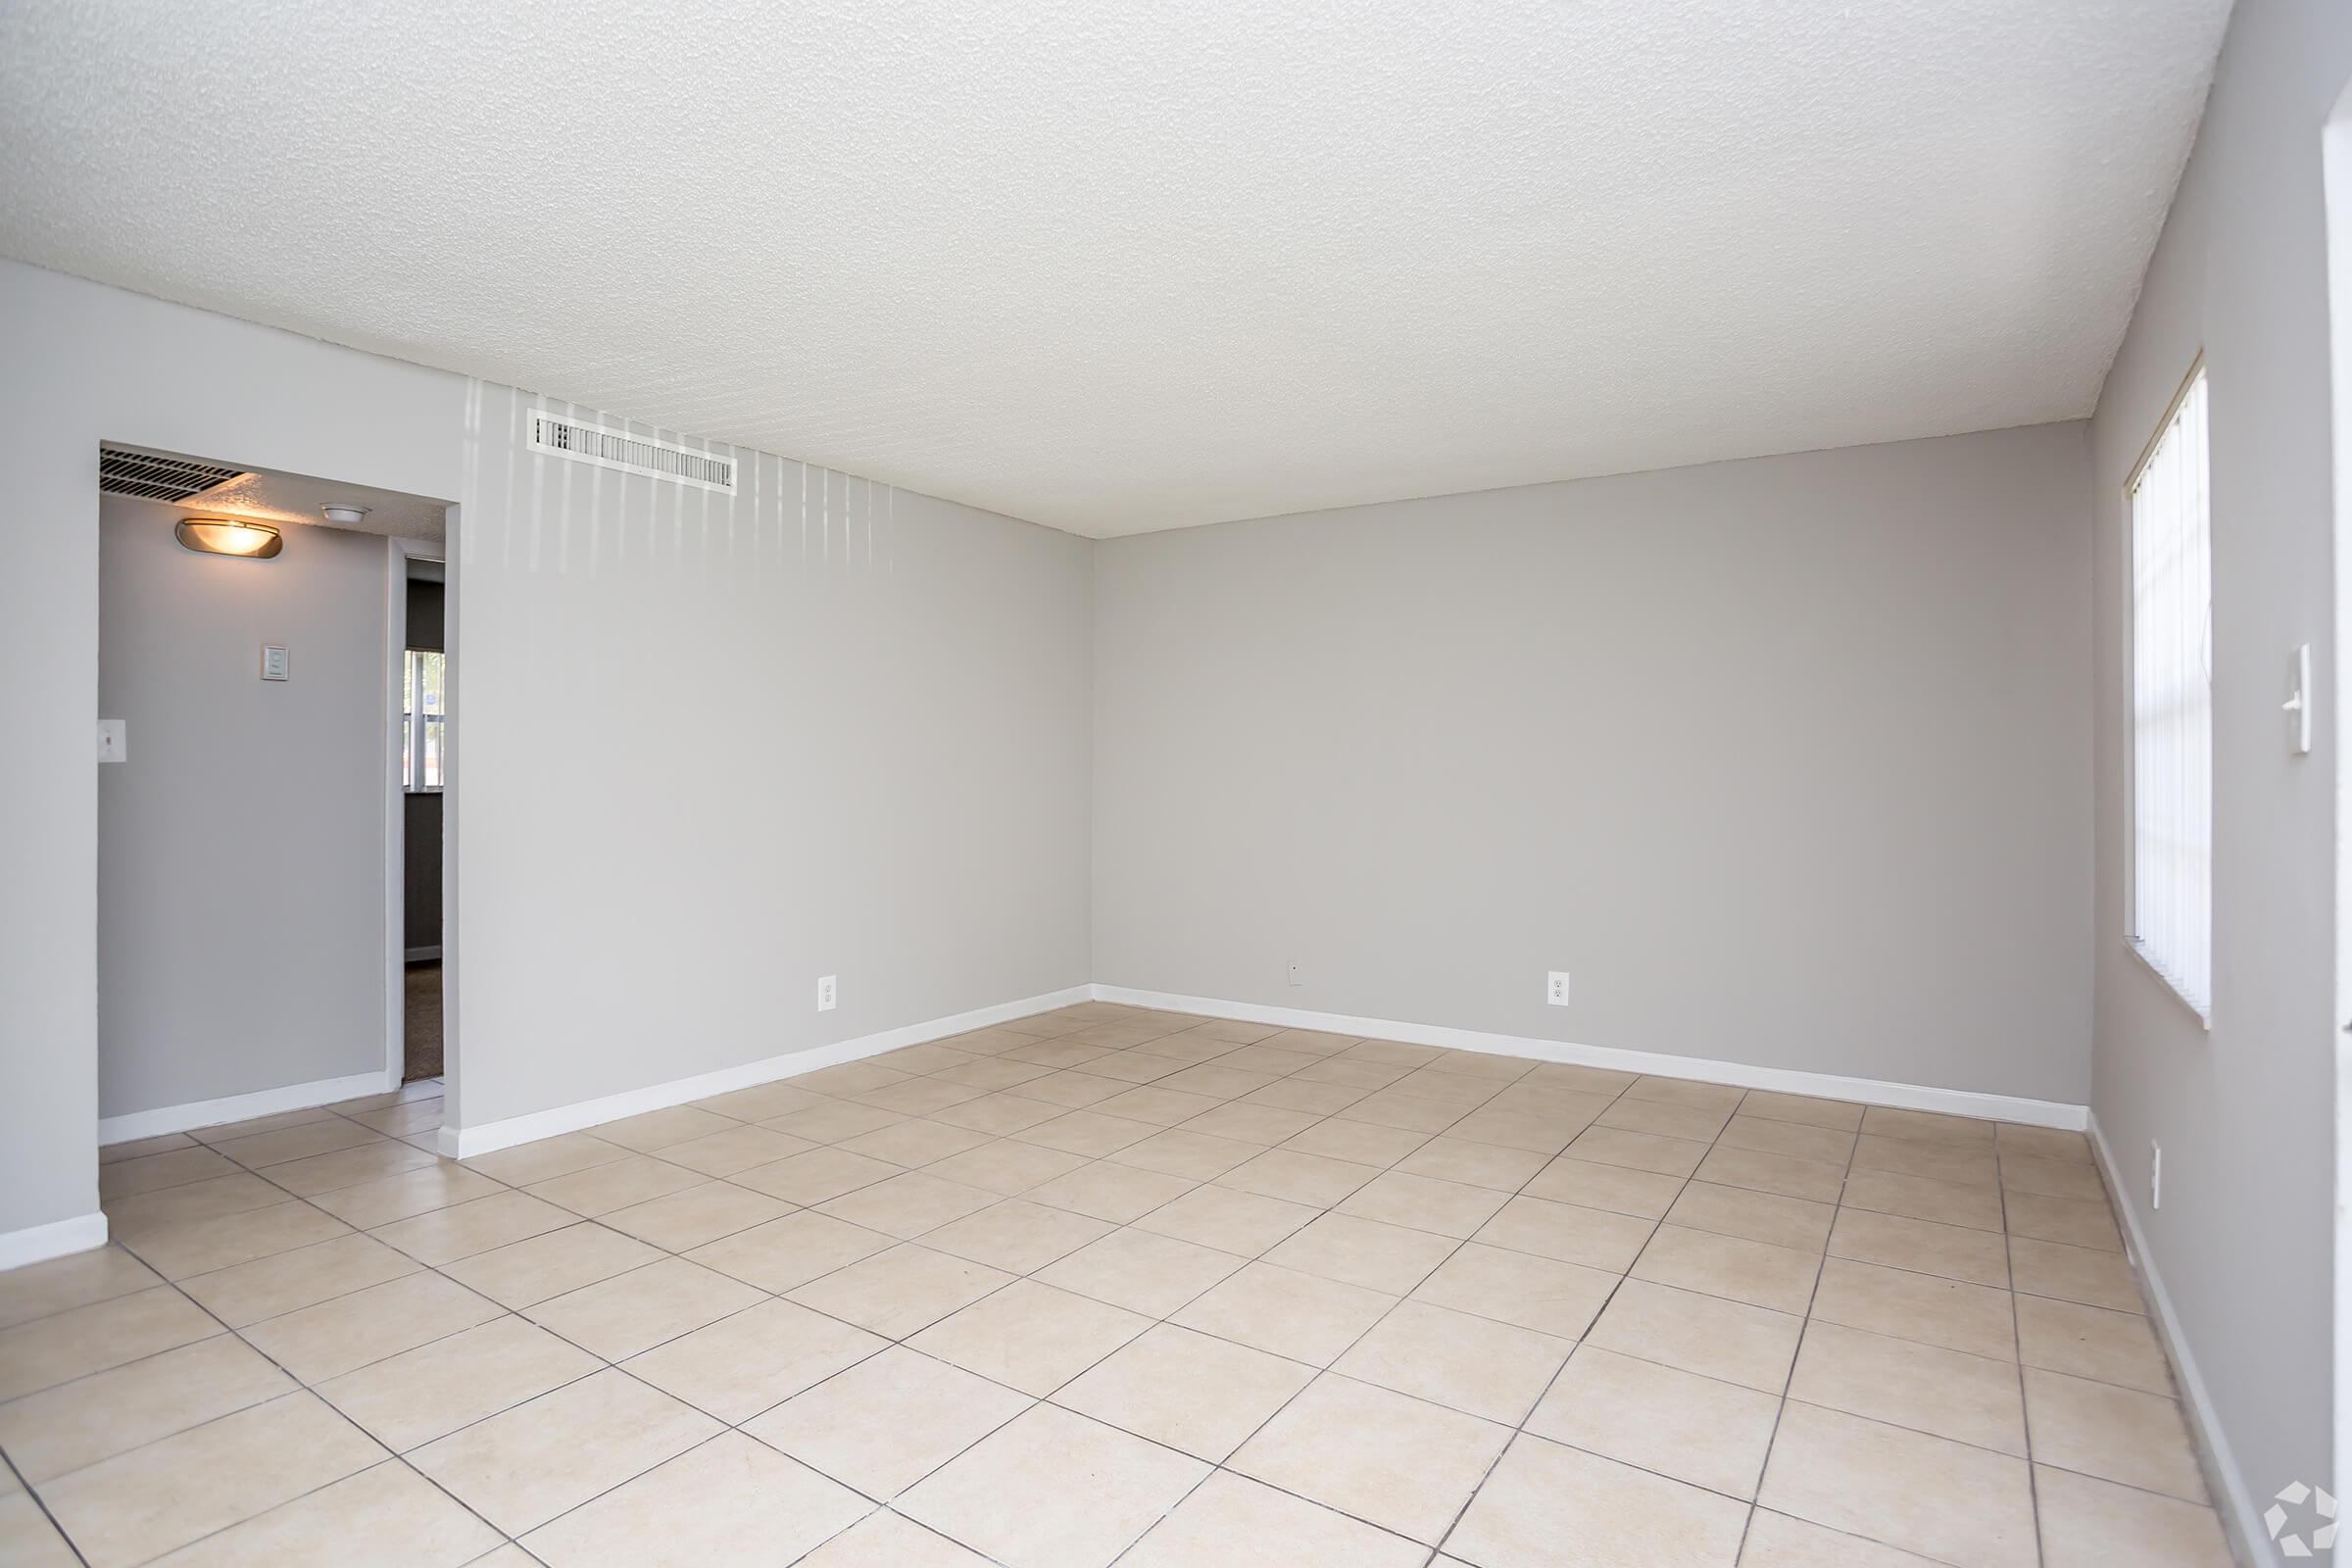 a room with a tile floor